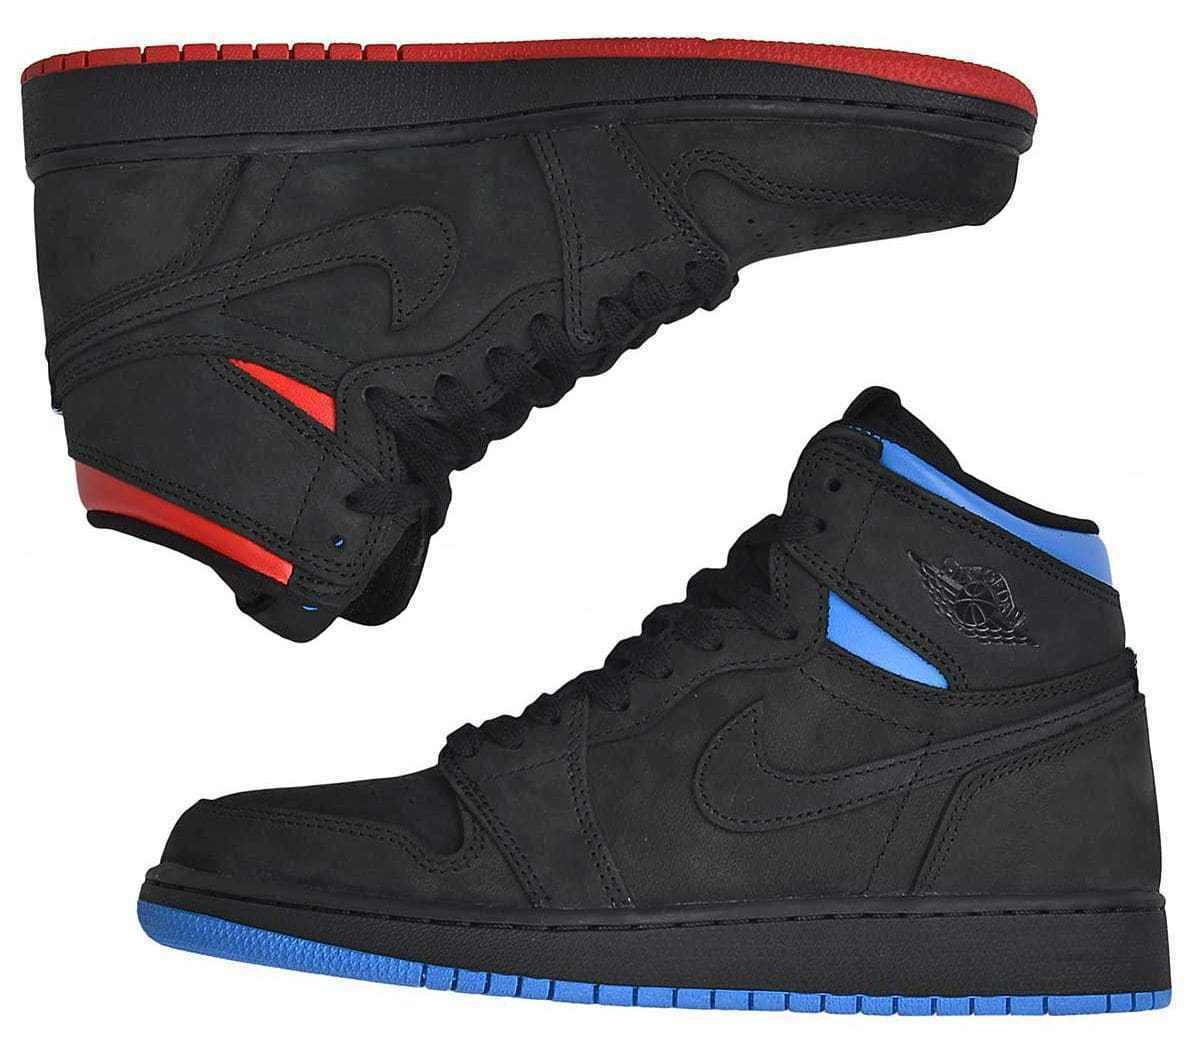 Nike Air Jordan 1 Retro High OG Quai 54 Q54 Size 13. AH1040-054. Black Red bluee